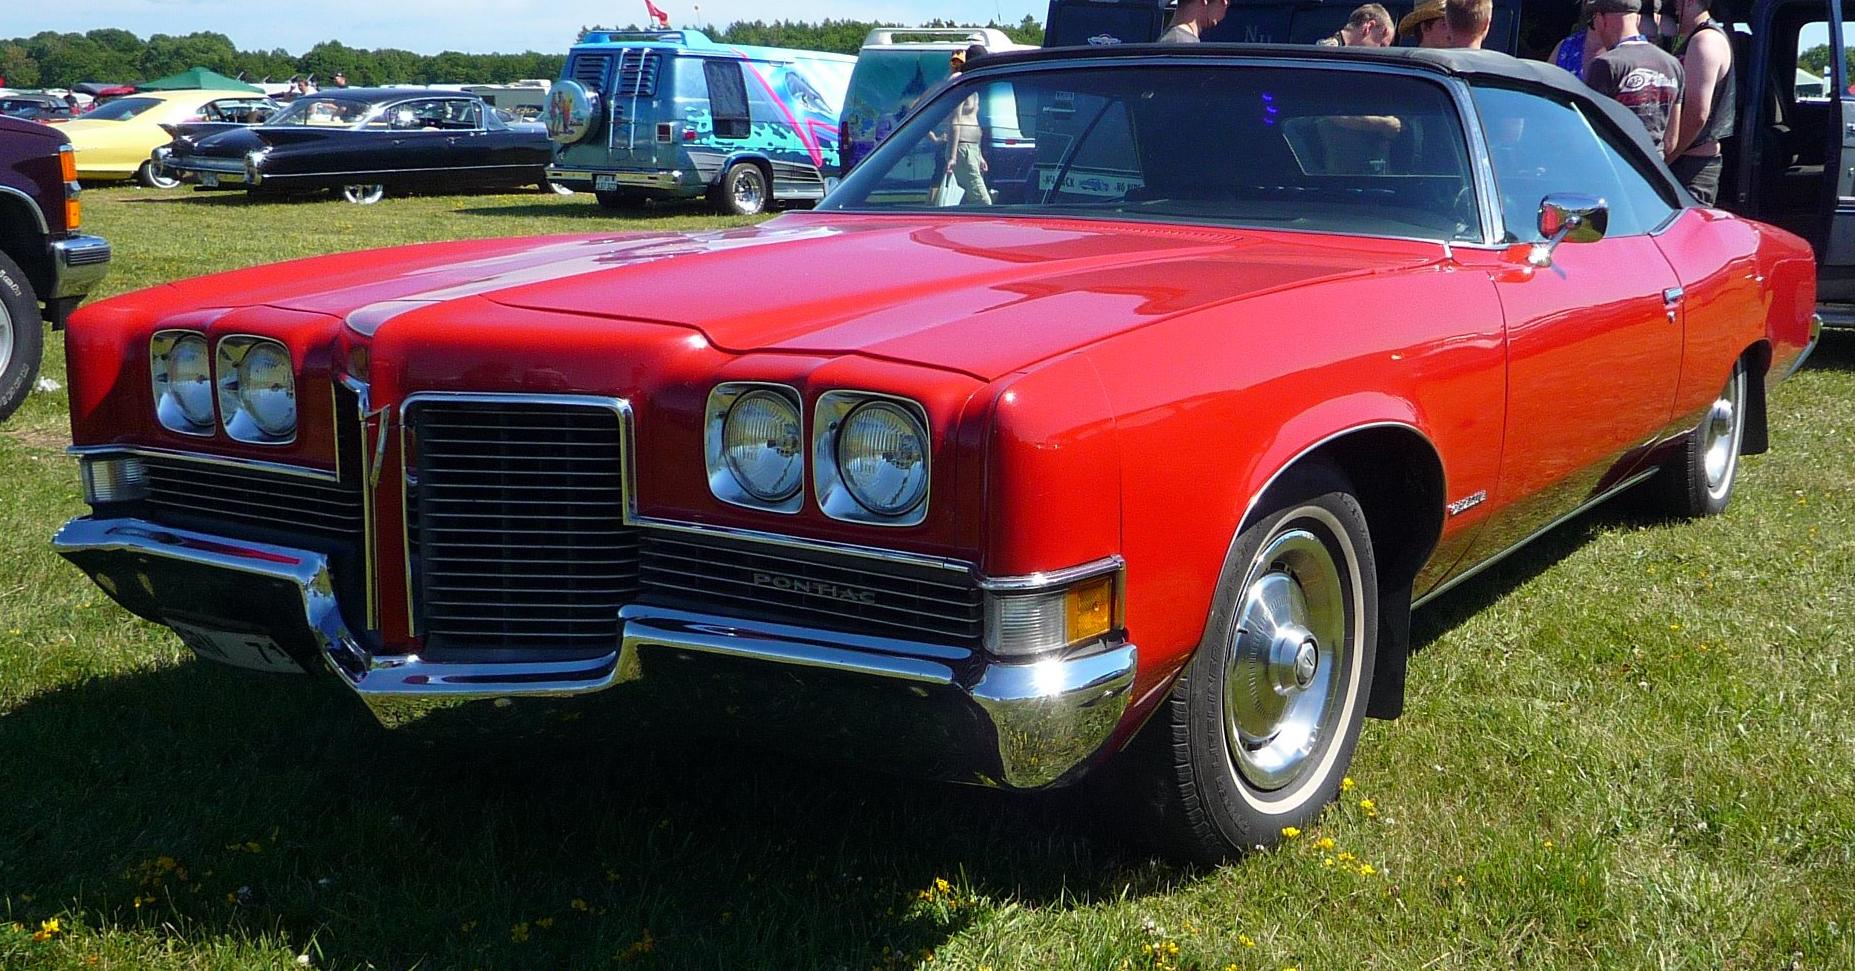 1971 Impala Convertible For Sale Craigslist Joy Studio Design Gallery Best Design